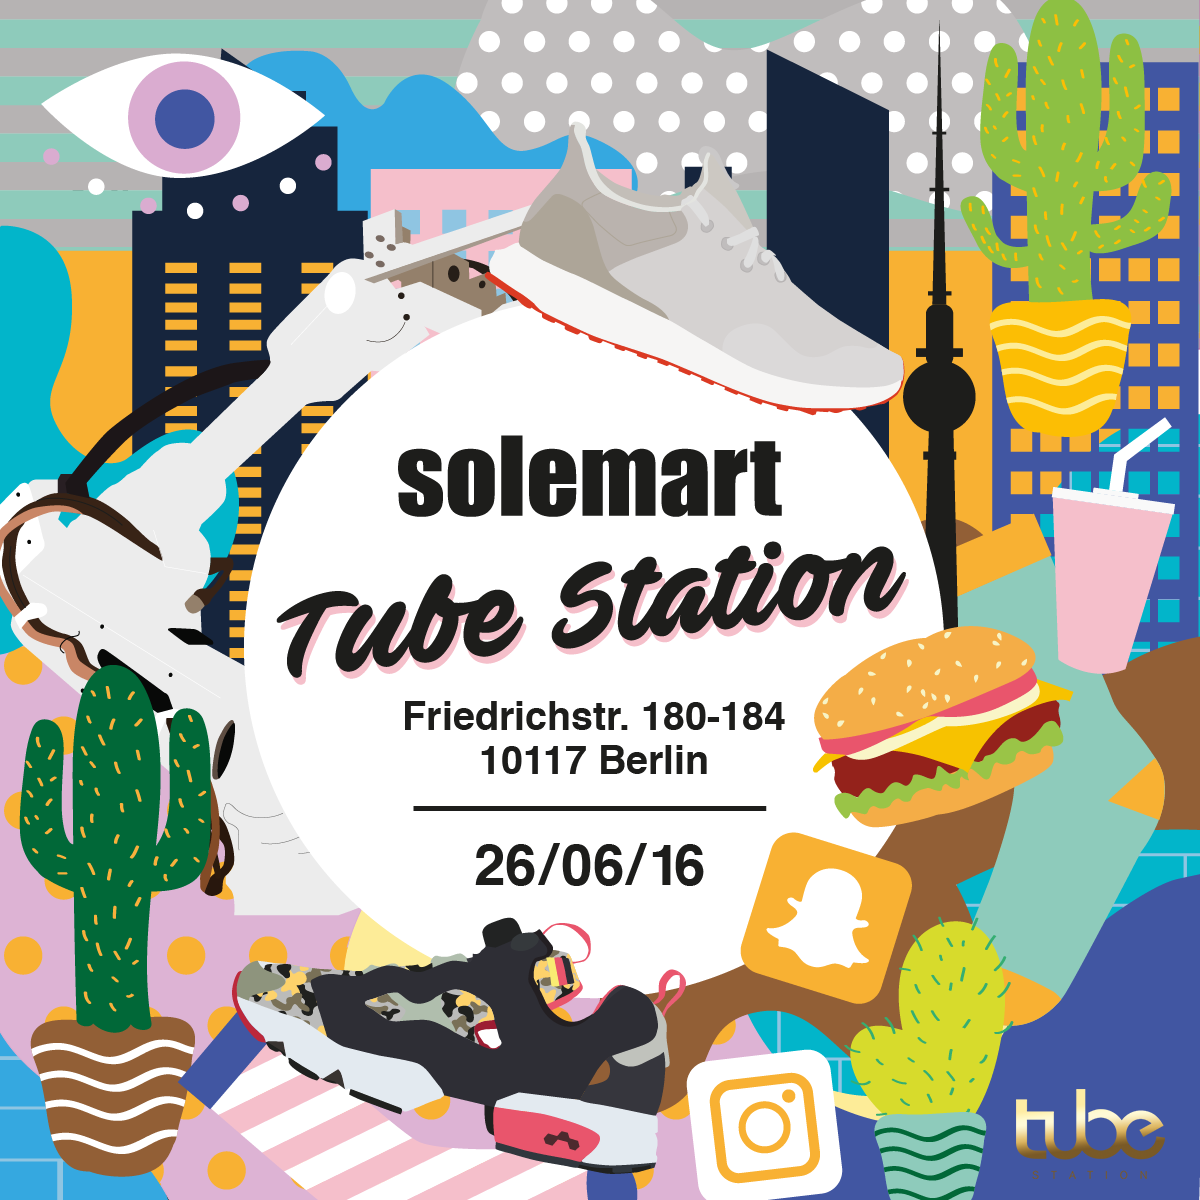 solemart_insta_RZ-01